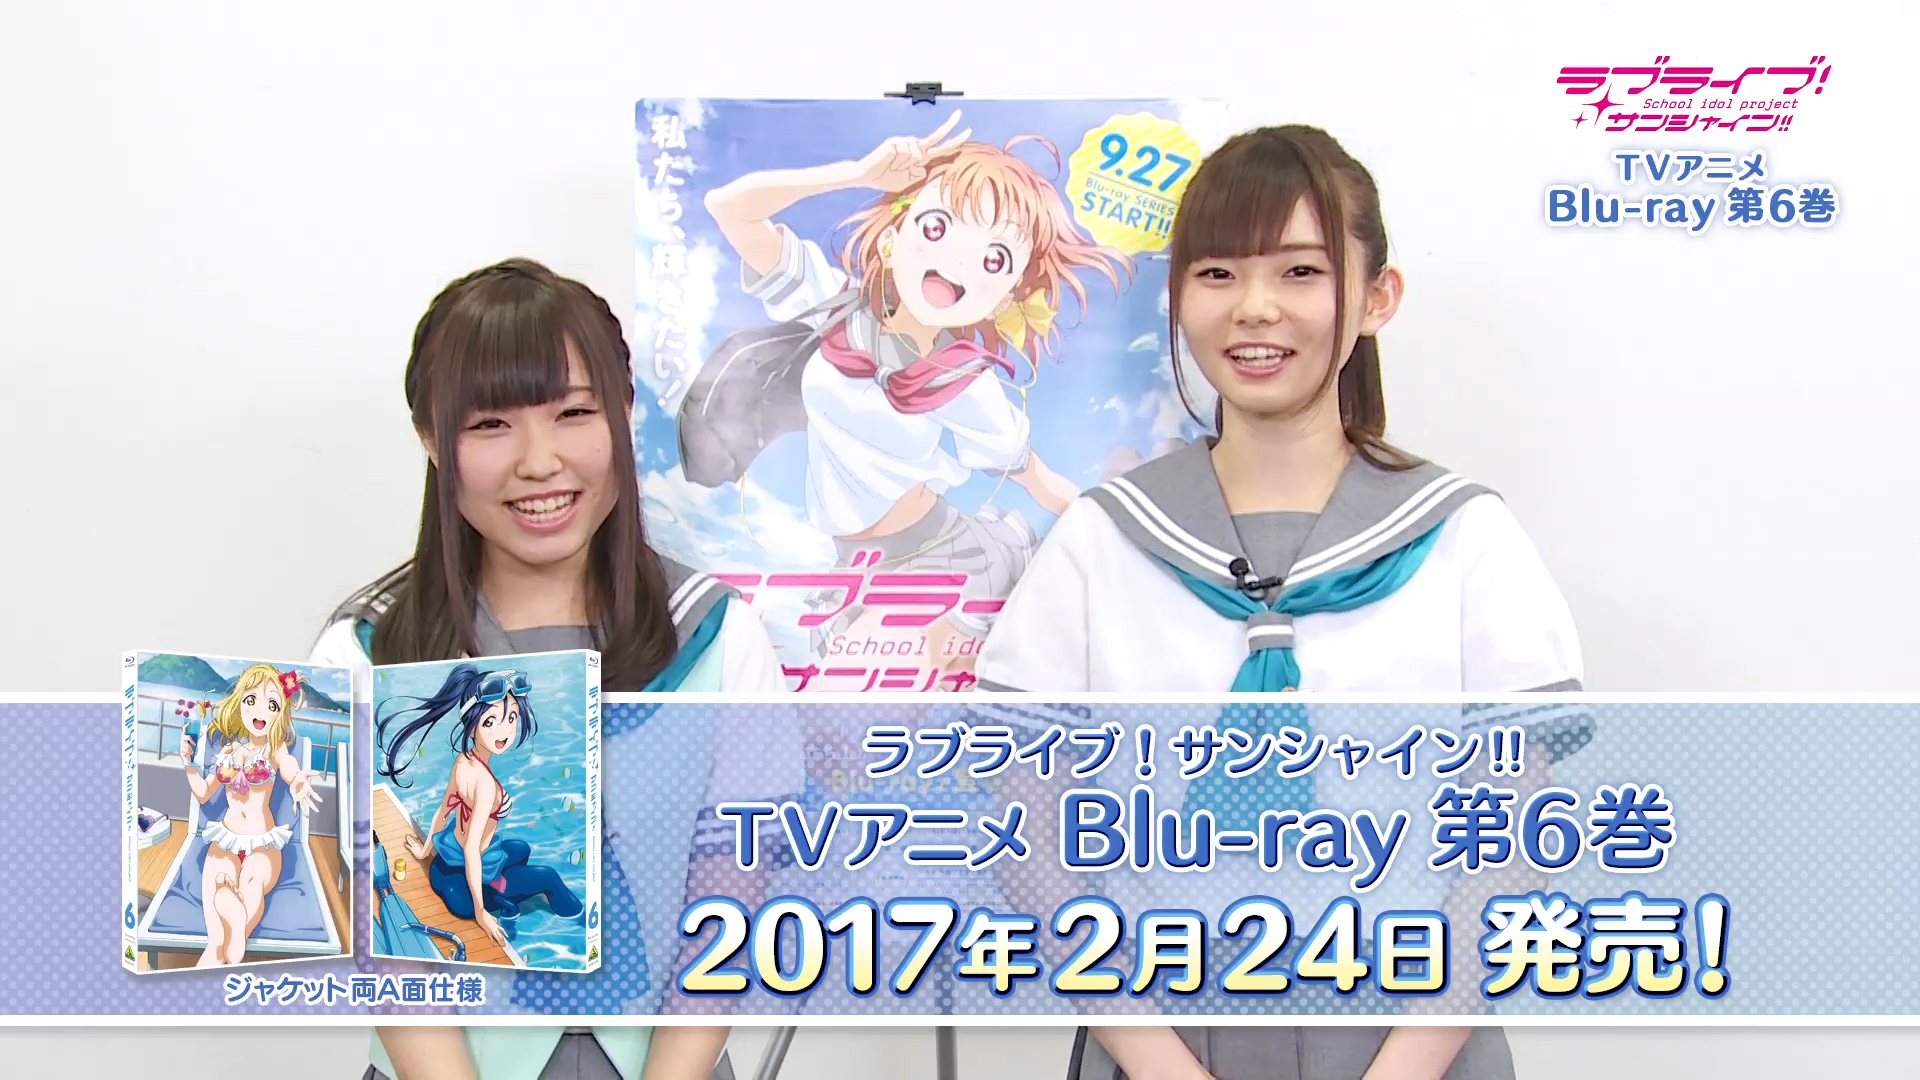 【V-STORAGE online限定】「ラブライブ!サンシャイン!!」Blu-ray第6巻紹介PV(出演:諏訪ななか&鈴木愛奈)